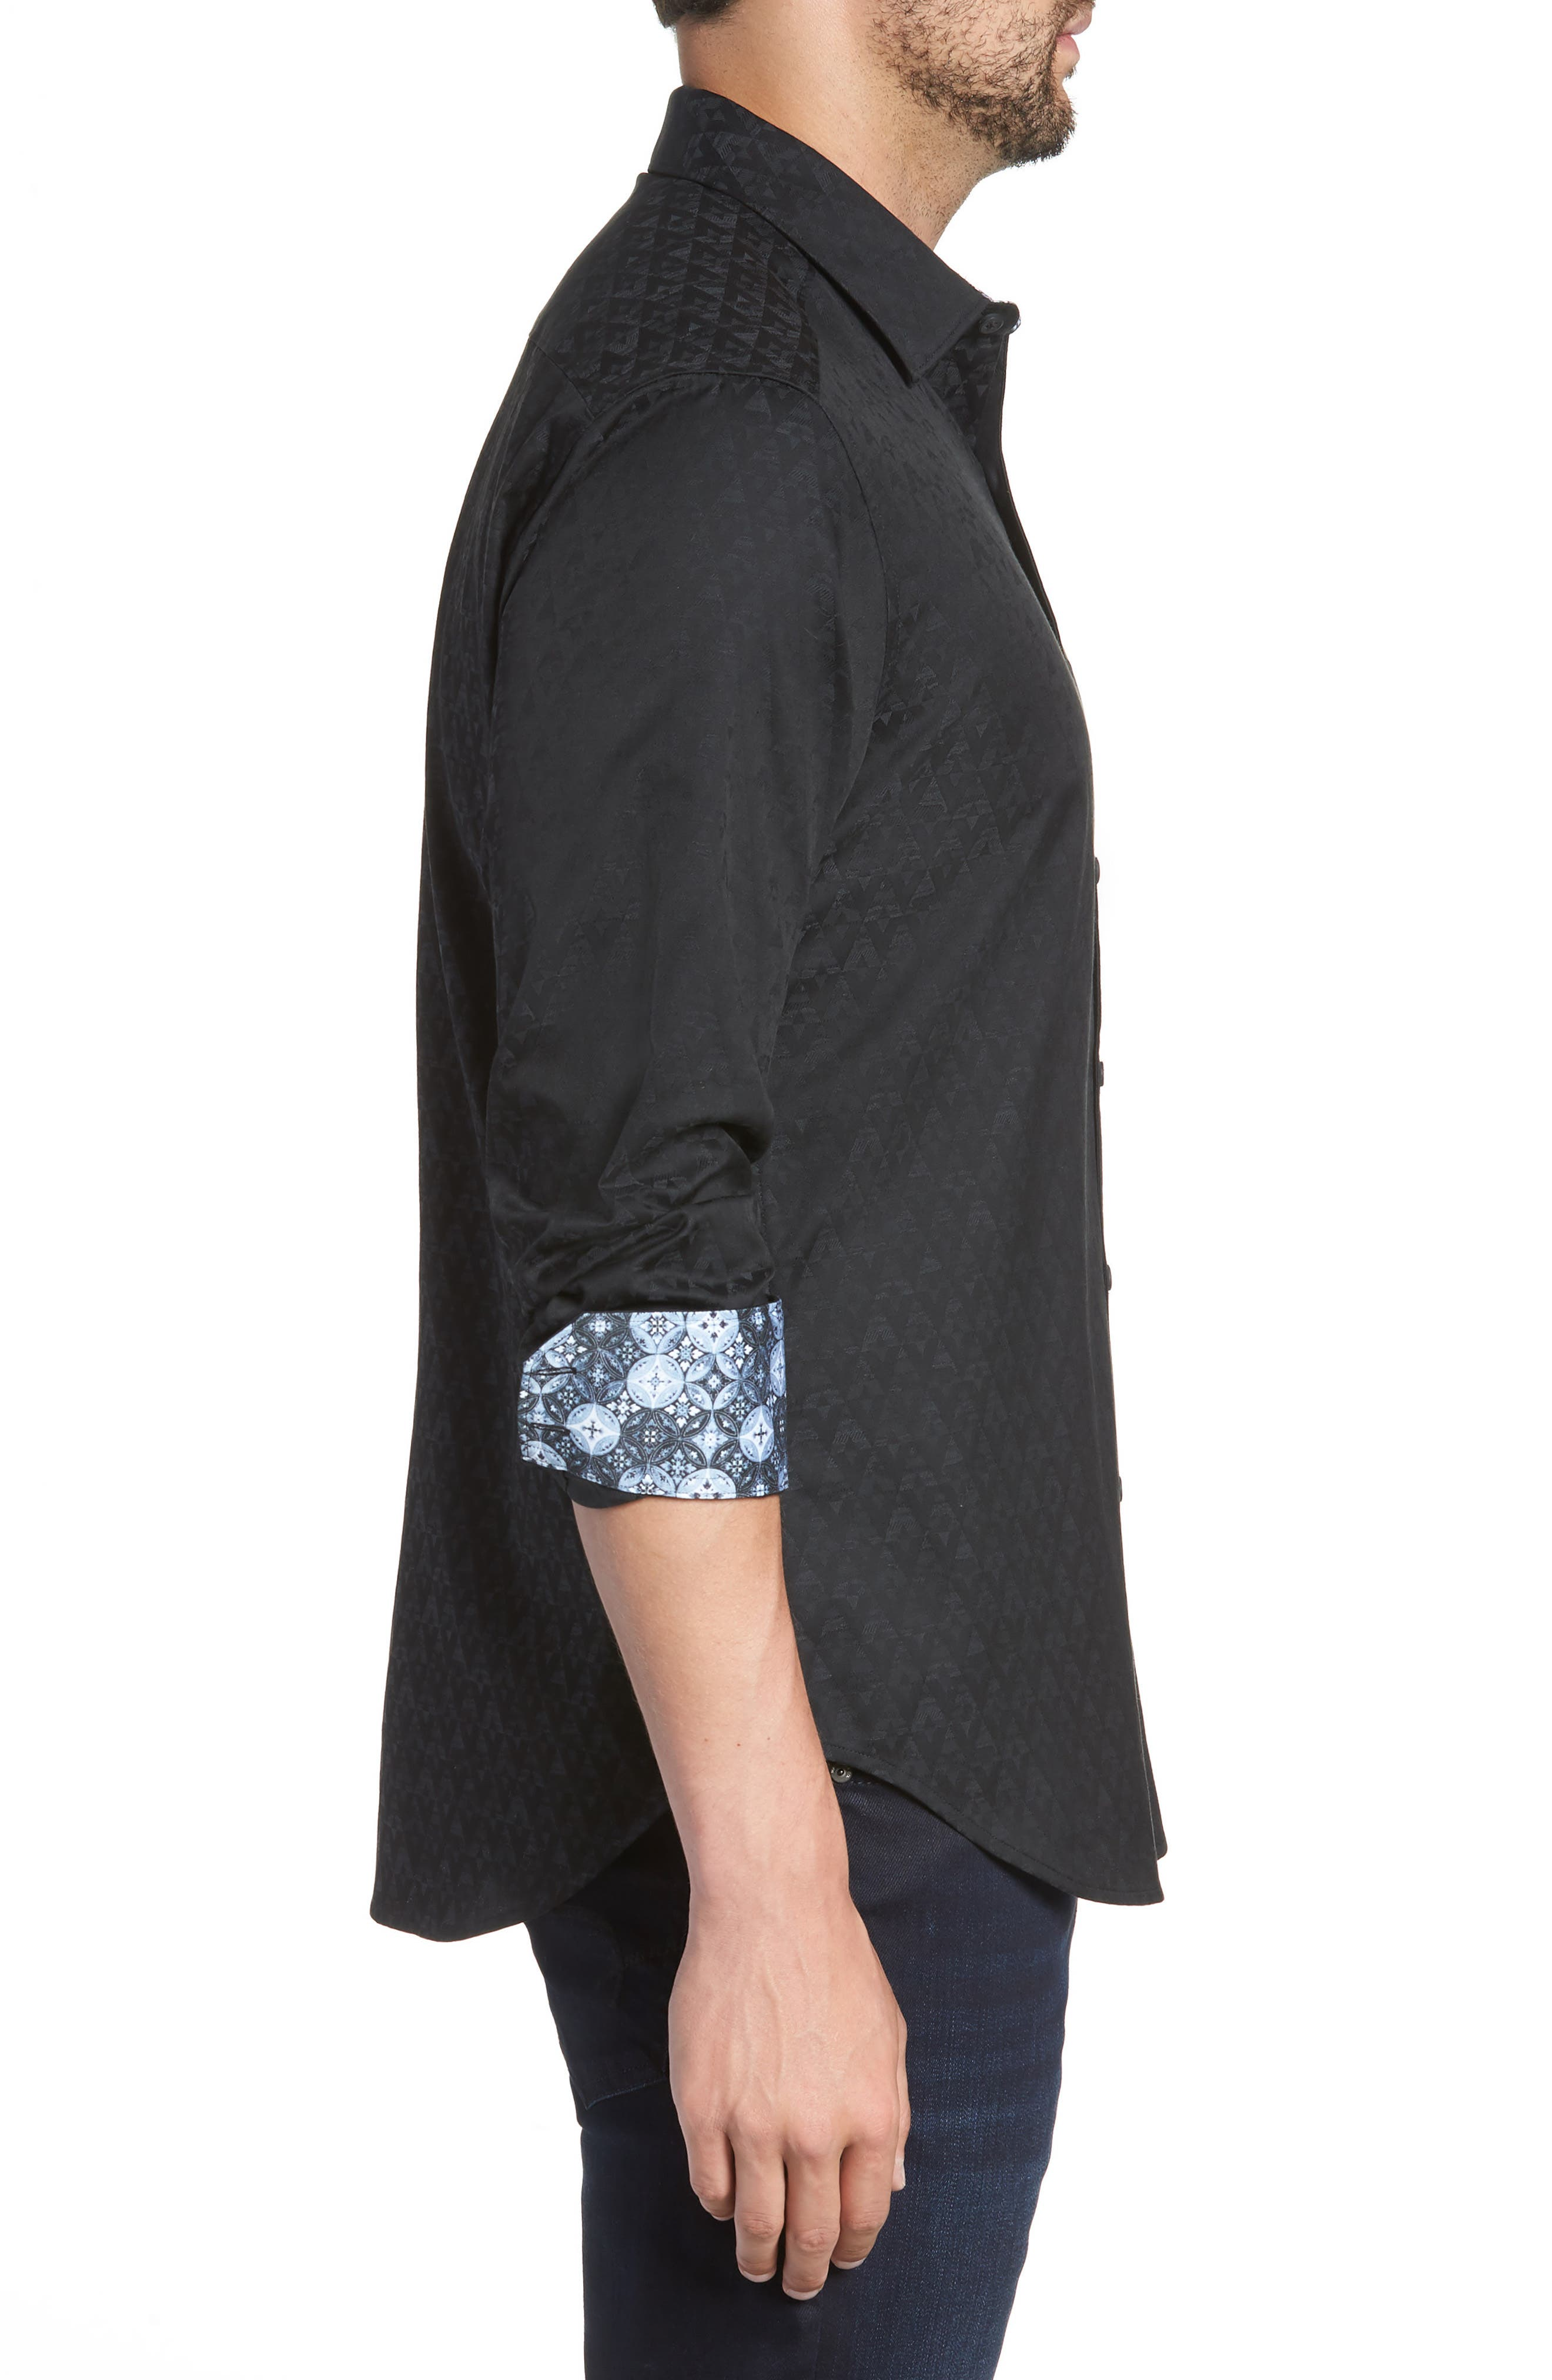 ROBERT GRAHAM, Classic Fit Stretch Geometric Sport Shirt, Alternate thumbnail 3, color, BLACK